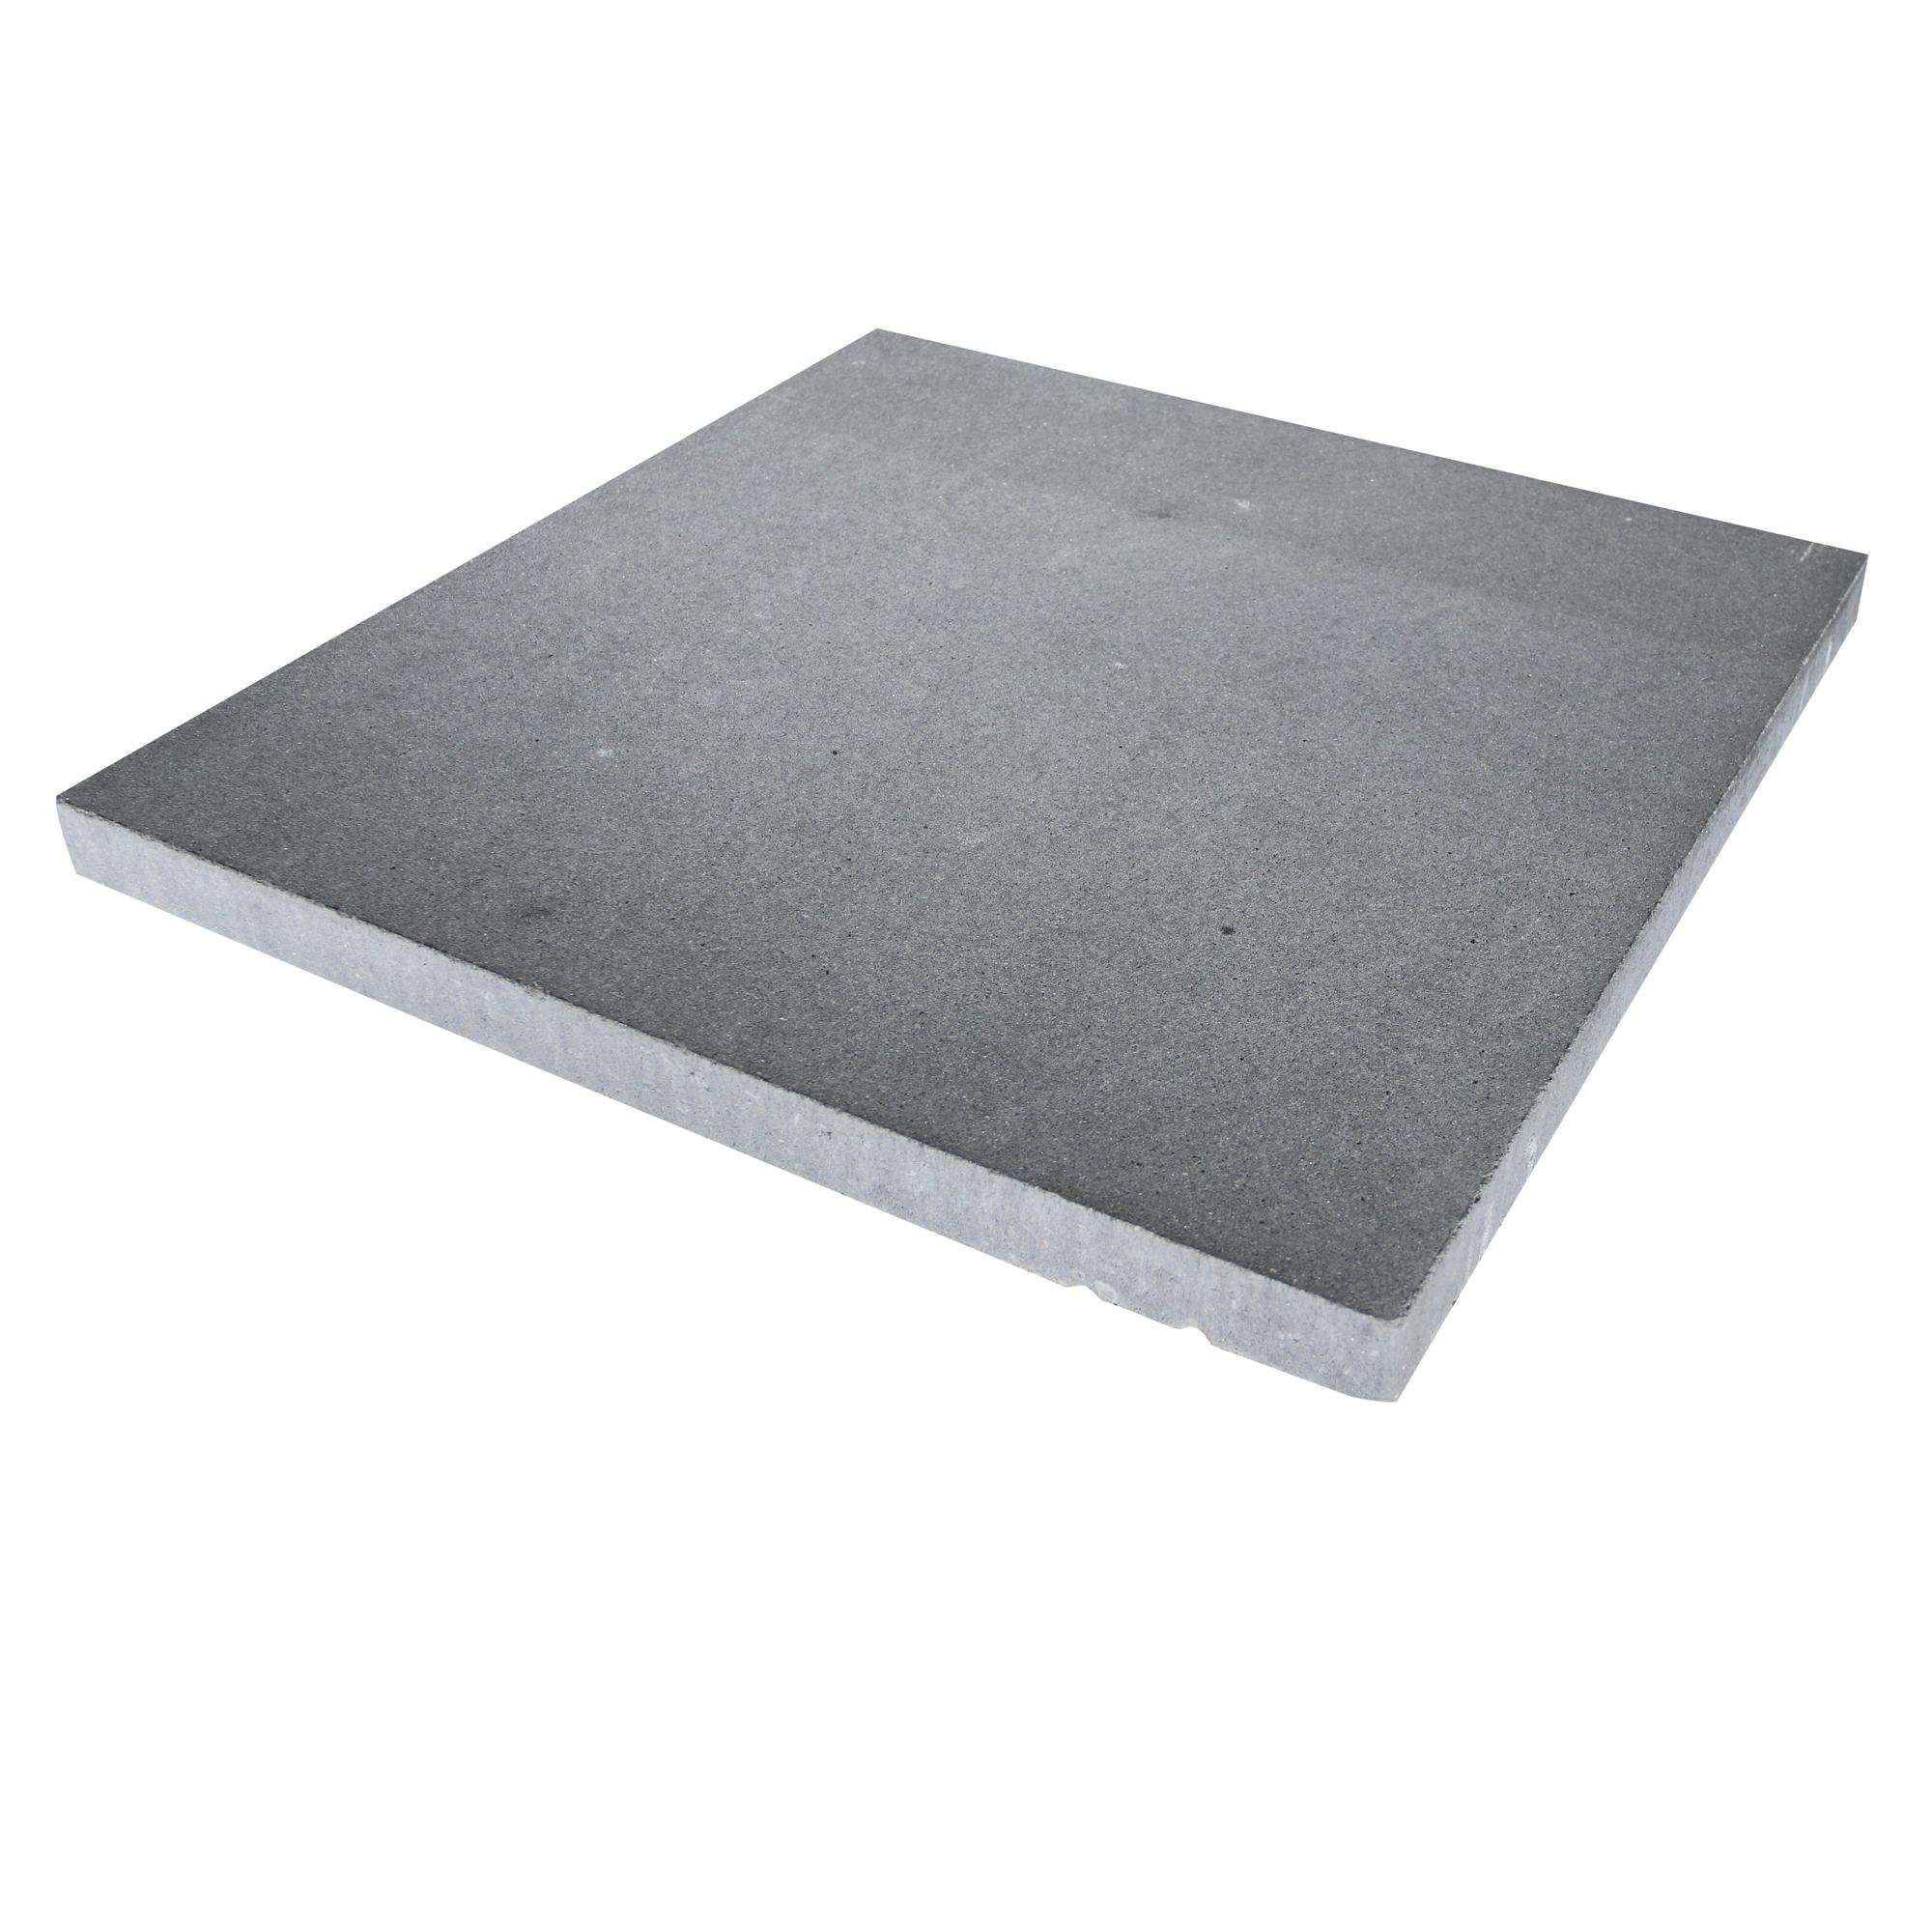 Terrastegel Beton Vegas Zwart Nuance 60x60 cm 36 Tegels-12,96 m2